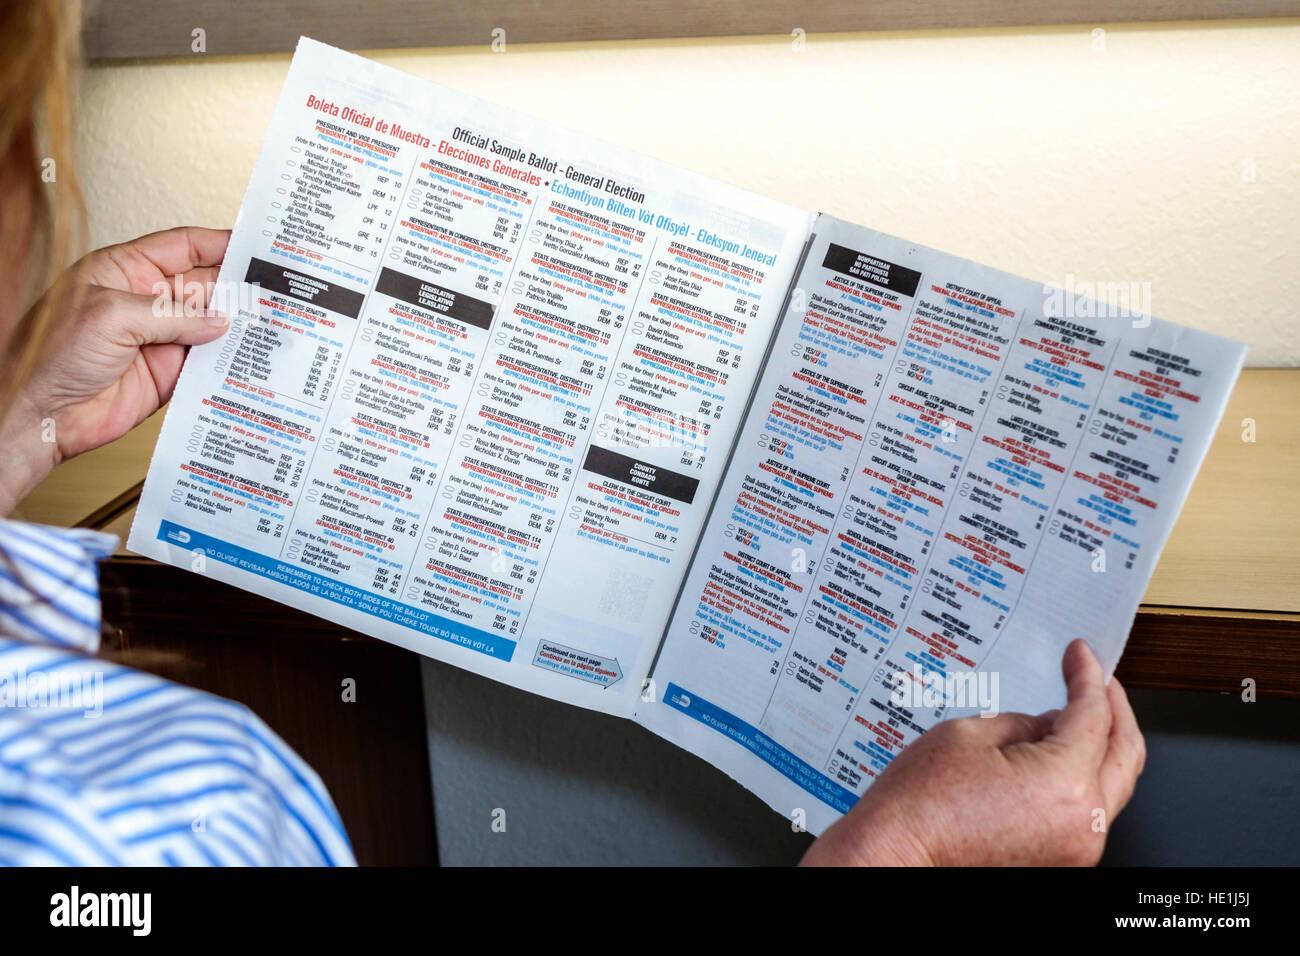 Voting dates in Melbourne